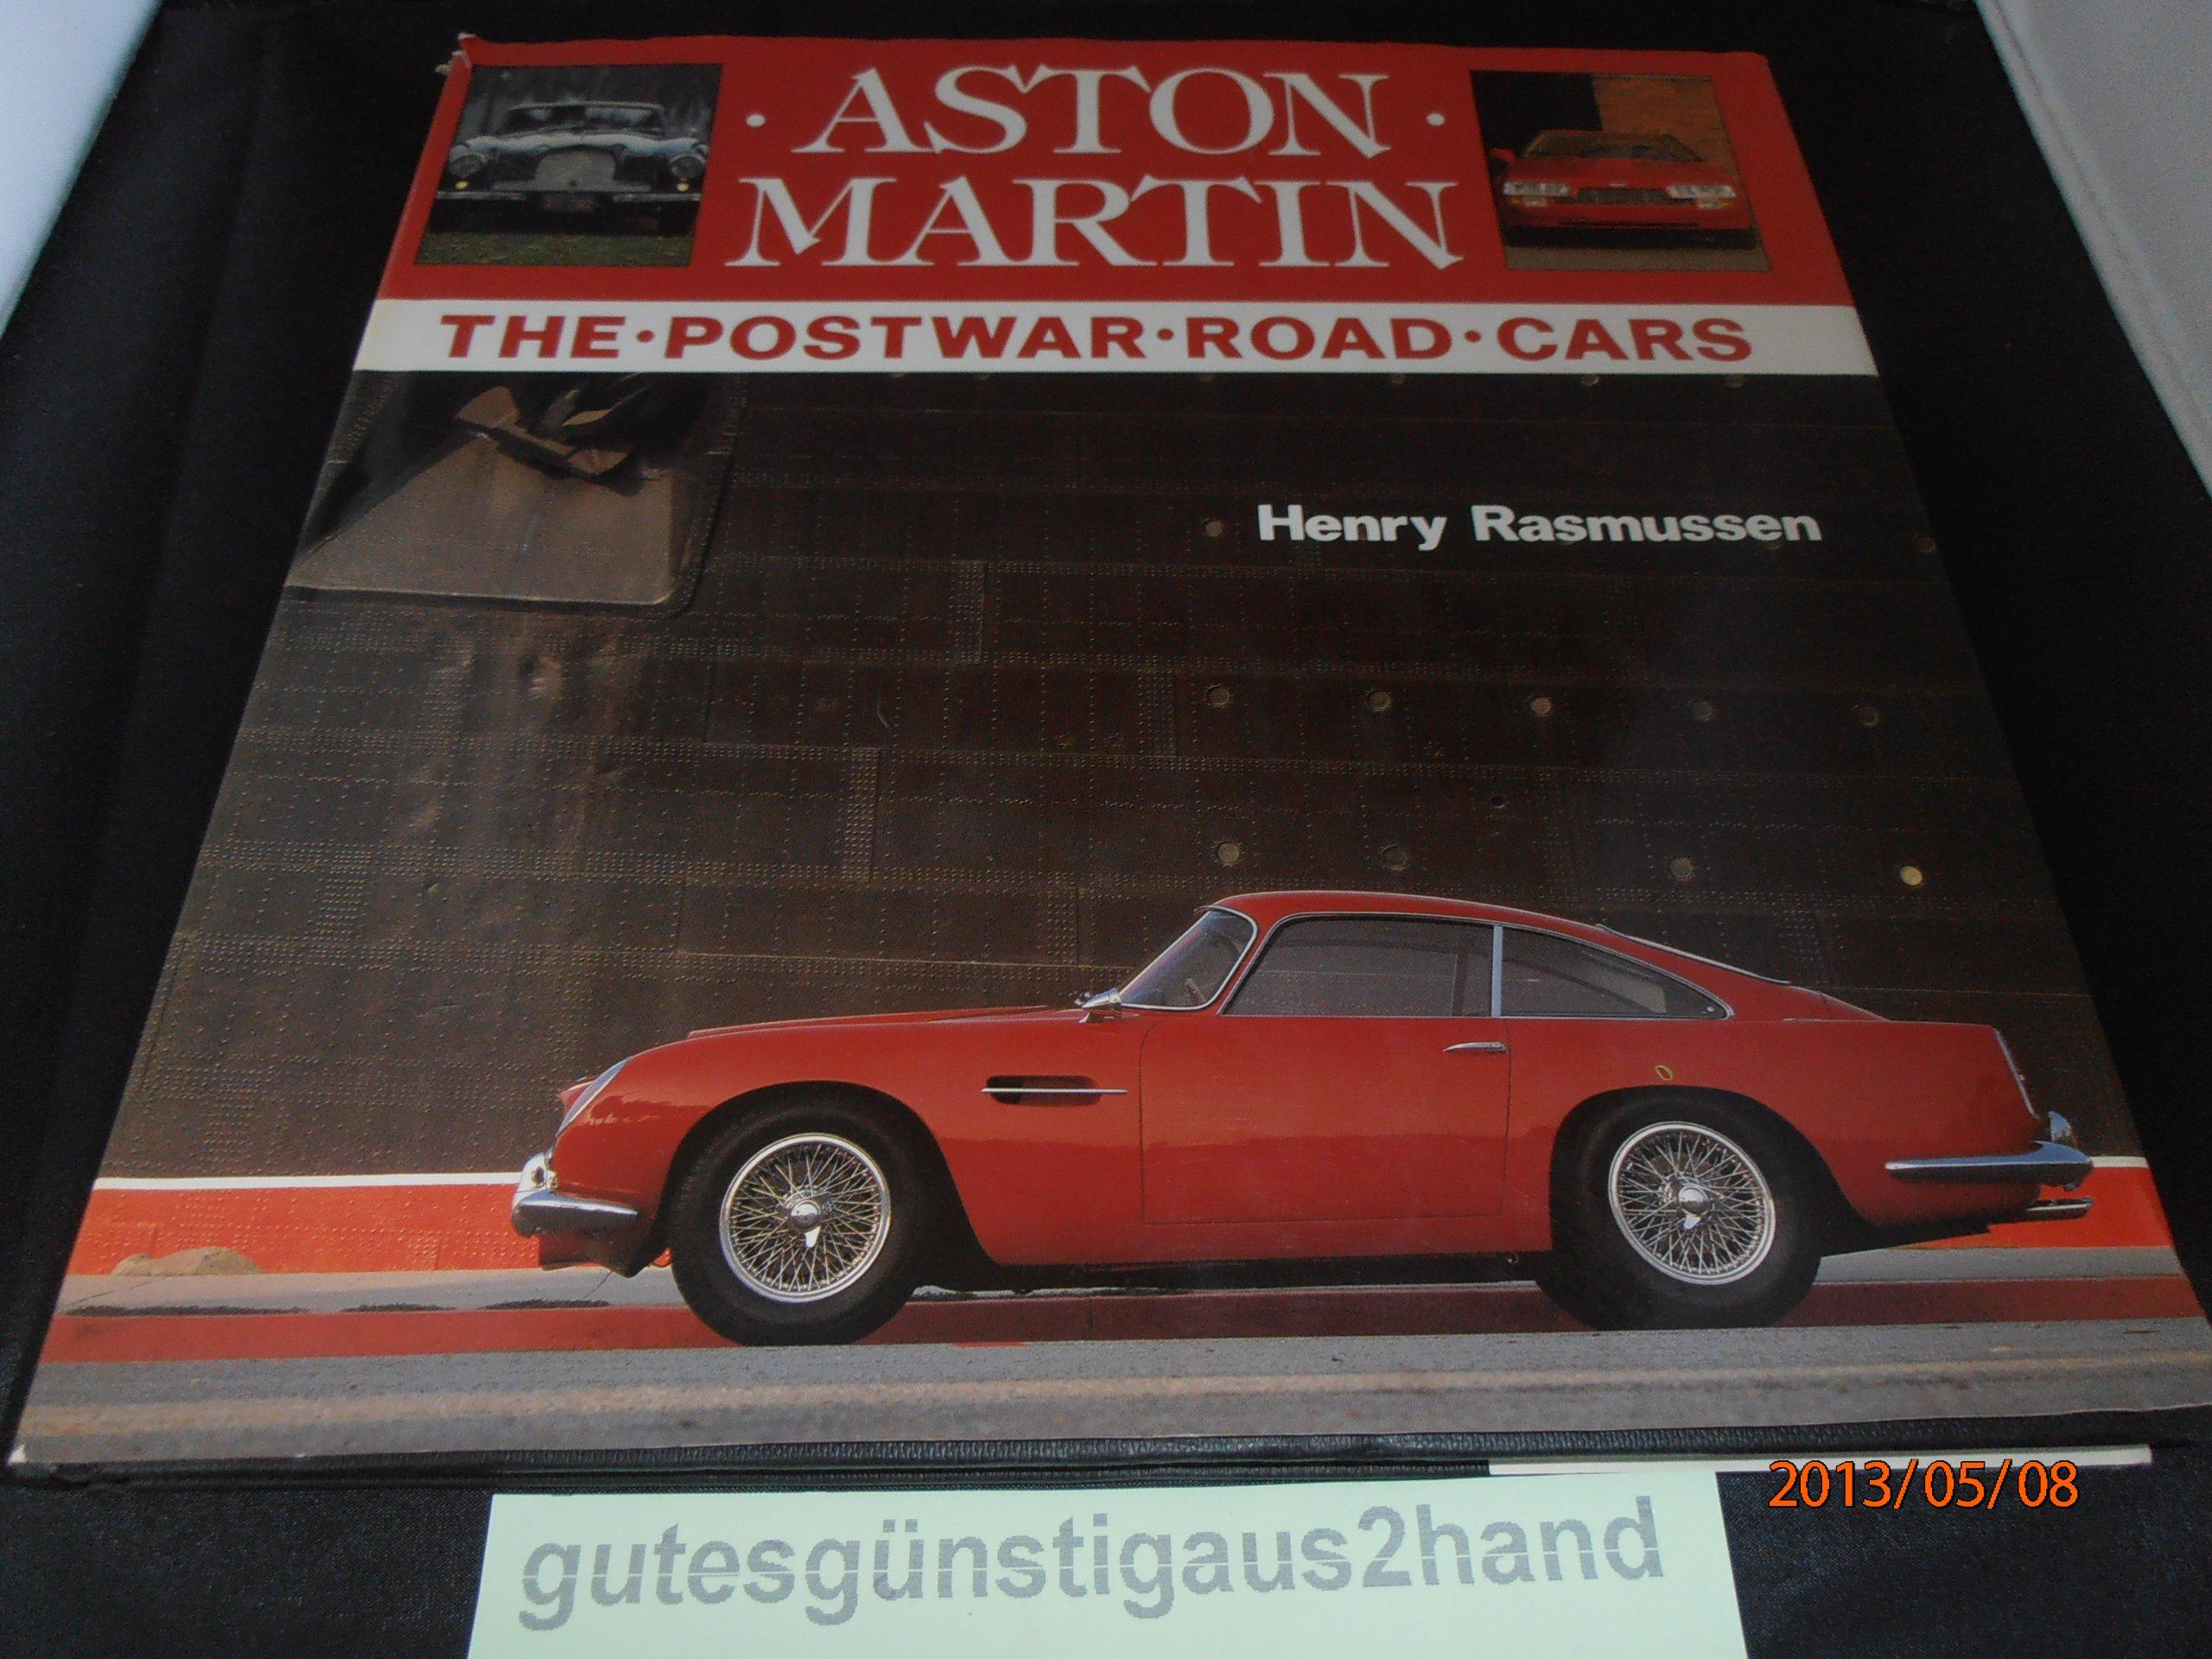 Aston Martin: The Postwar Road Cars: Henry Rasmussen: 9780854296934 ...